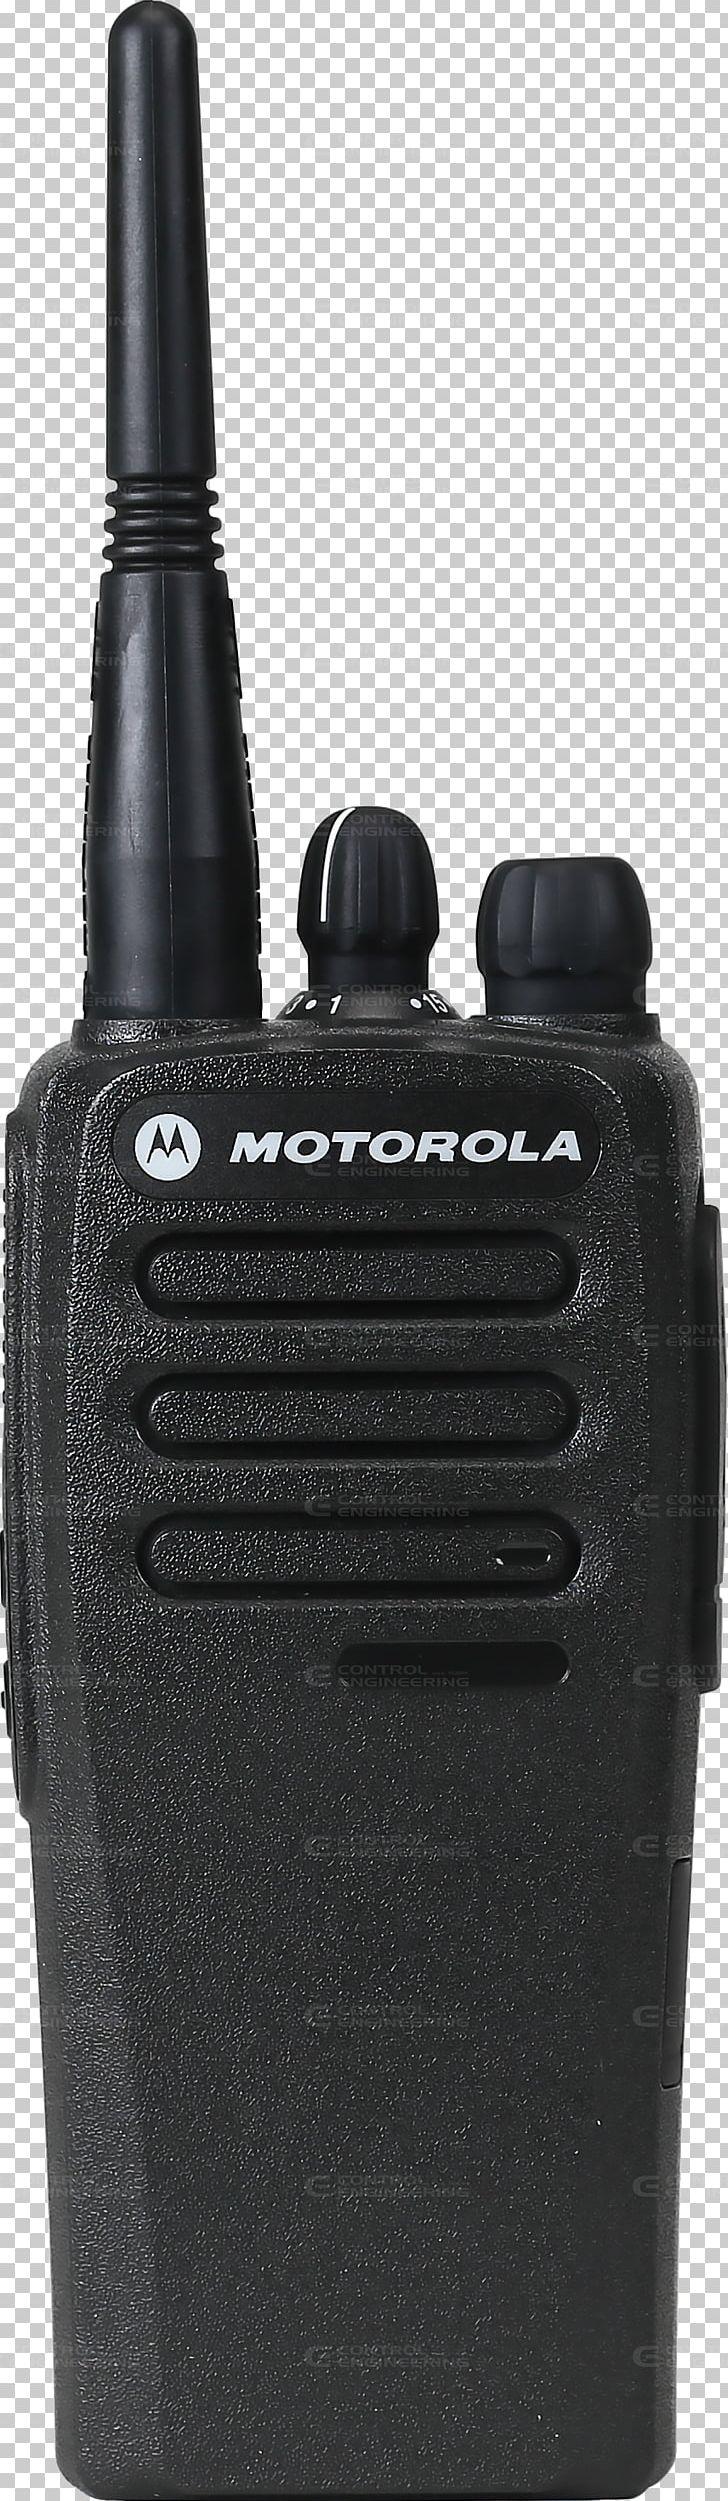 Two-way Radio Motorola Solutions Motorola CP200D Walkie-talkie PNG, Clipart, Analog Signal, Digital Mobile Radio, Electronic Device, Electronics, Mobile Radio Free PNG Download